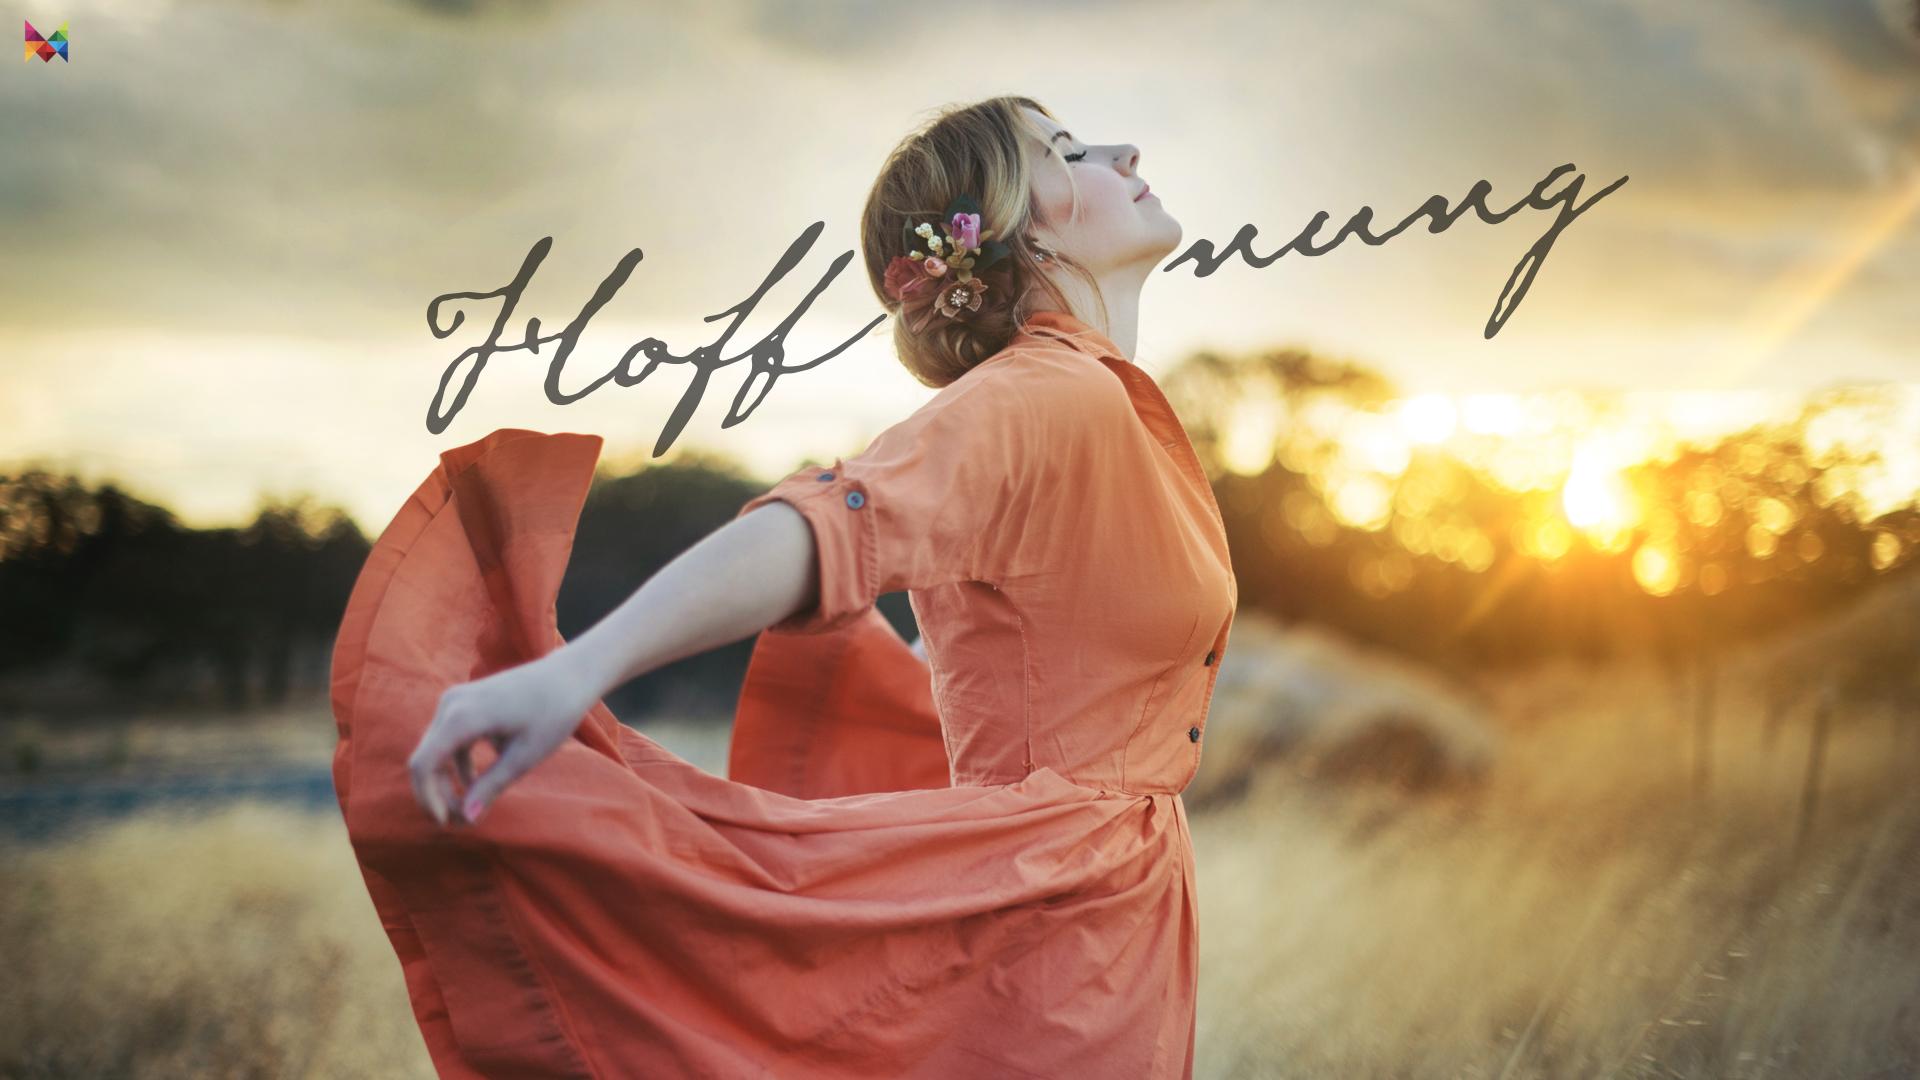 Hoffnung 02